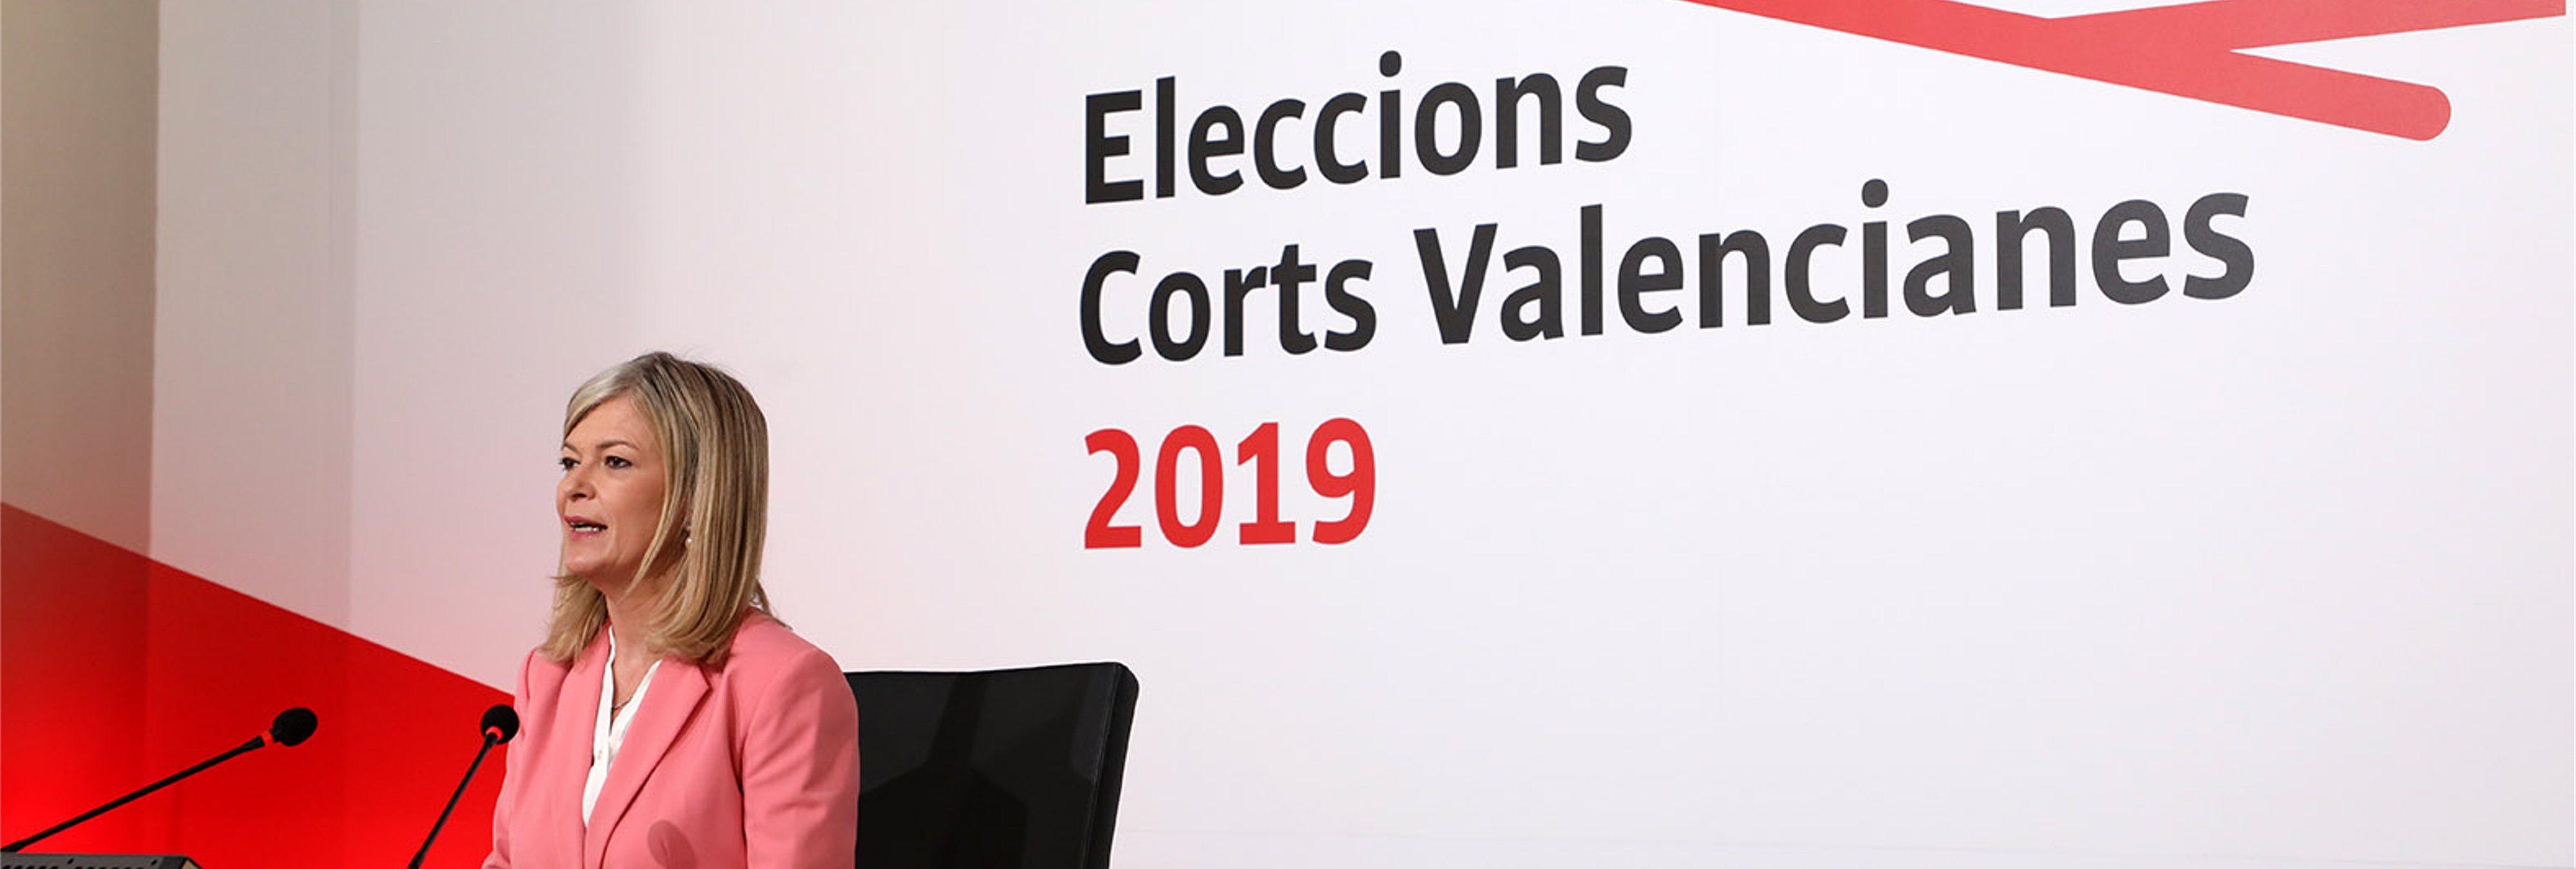 Sigue minuto a minuto las elecciones a la Generalitat Valenciana